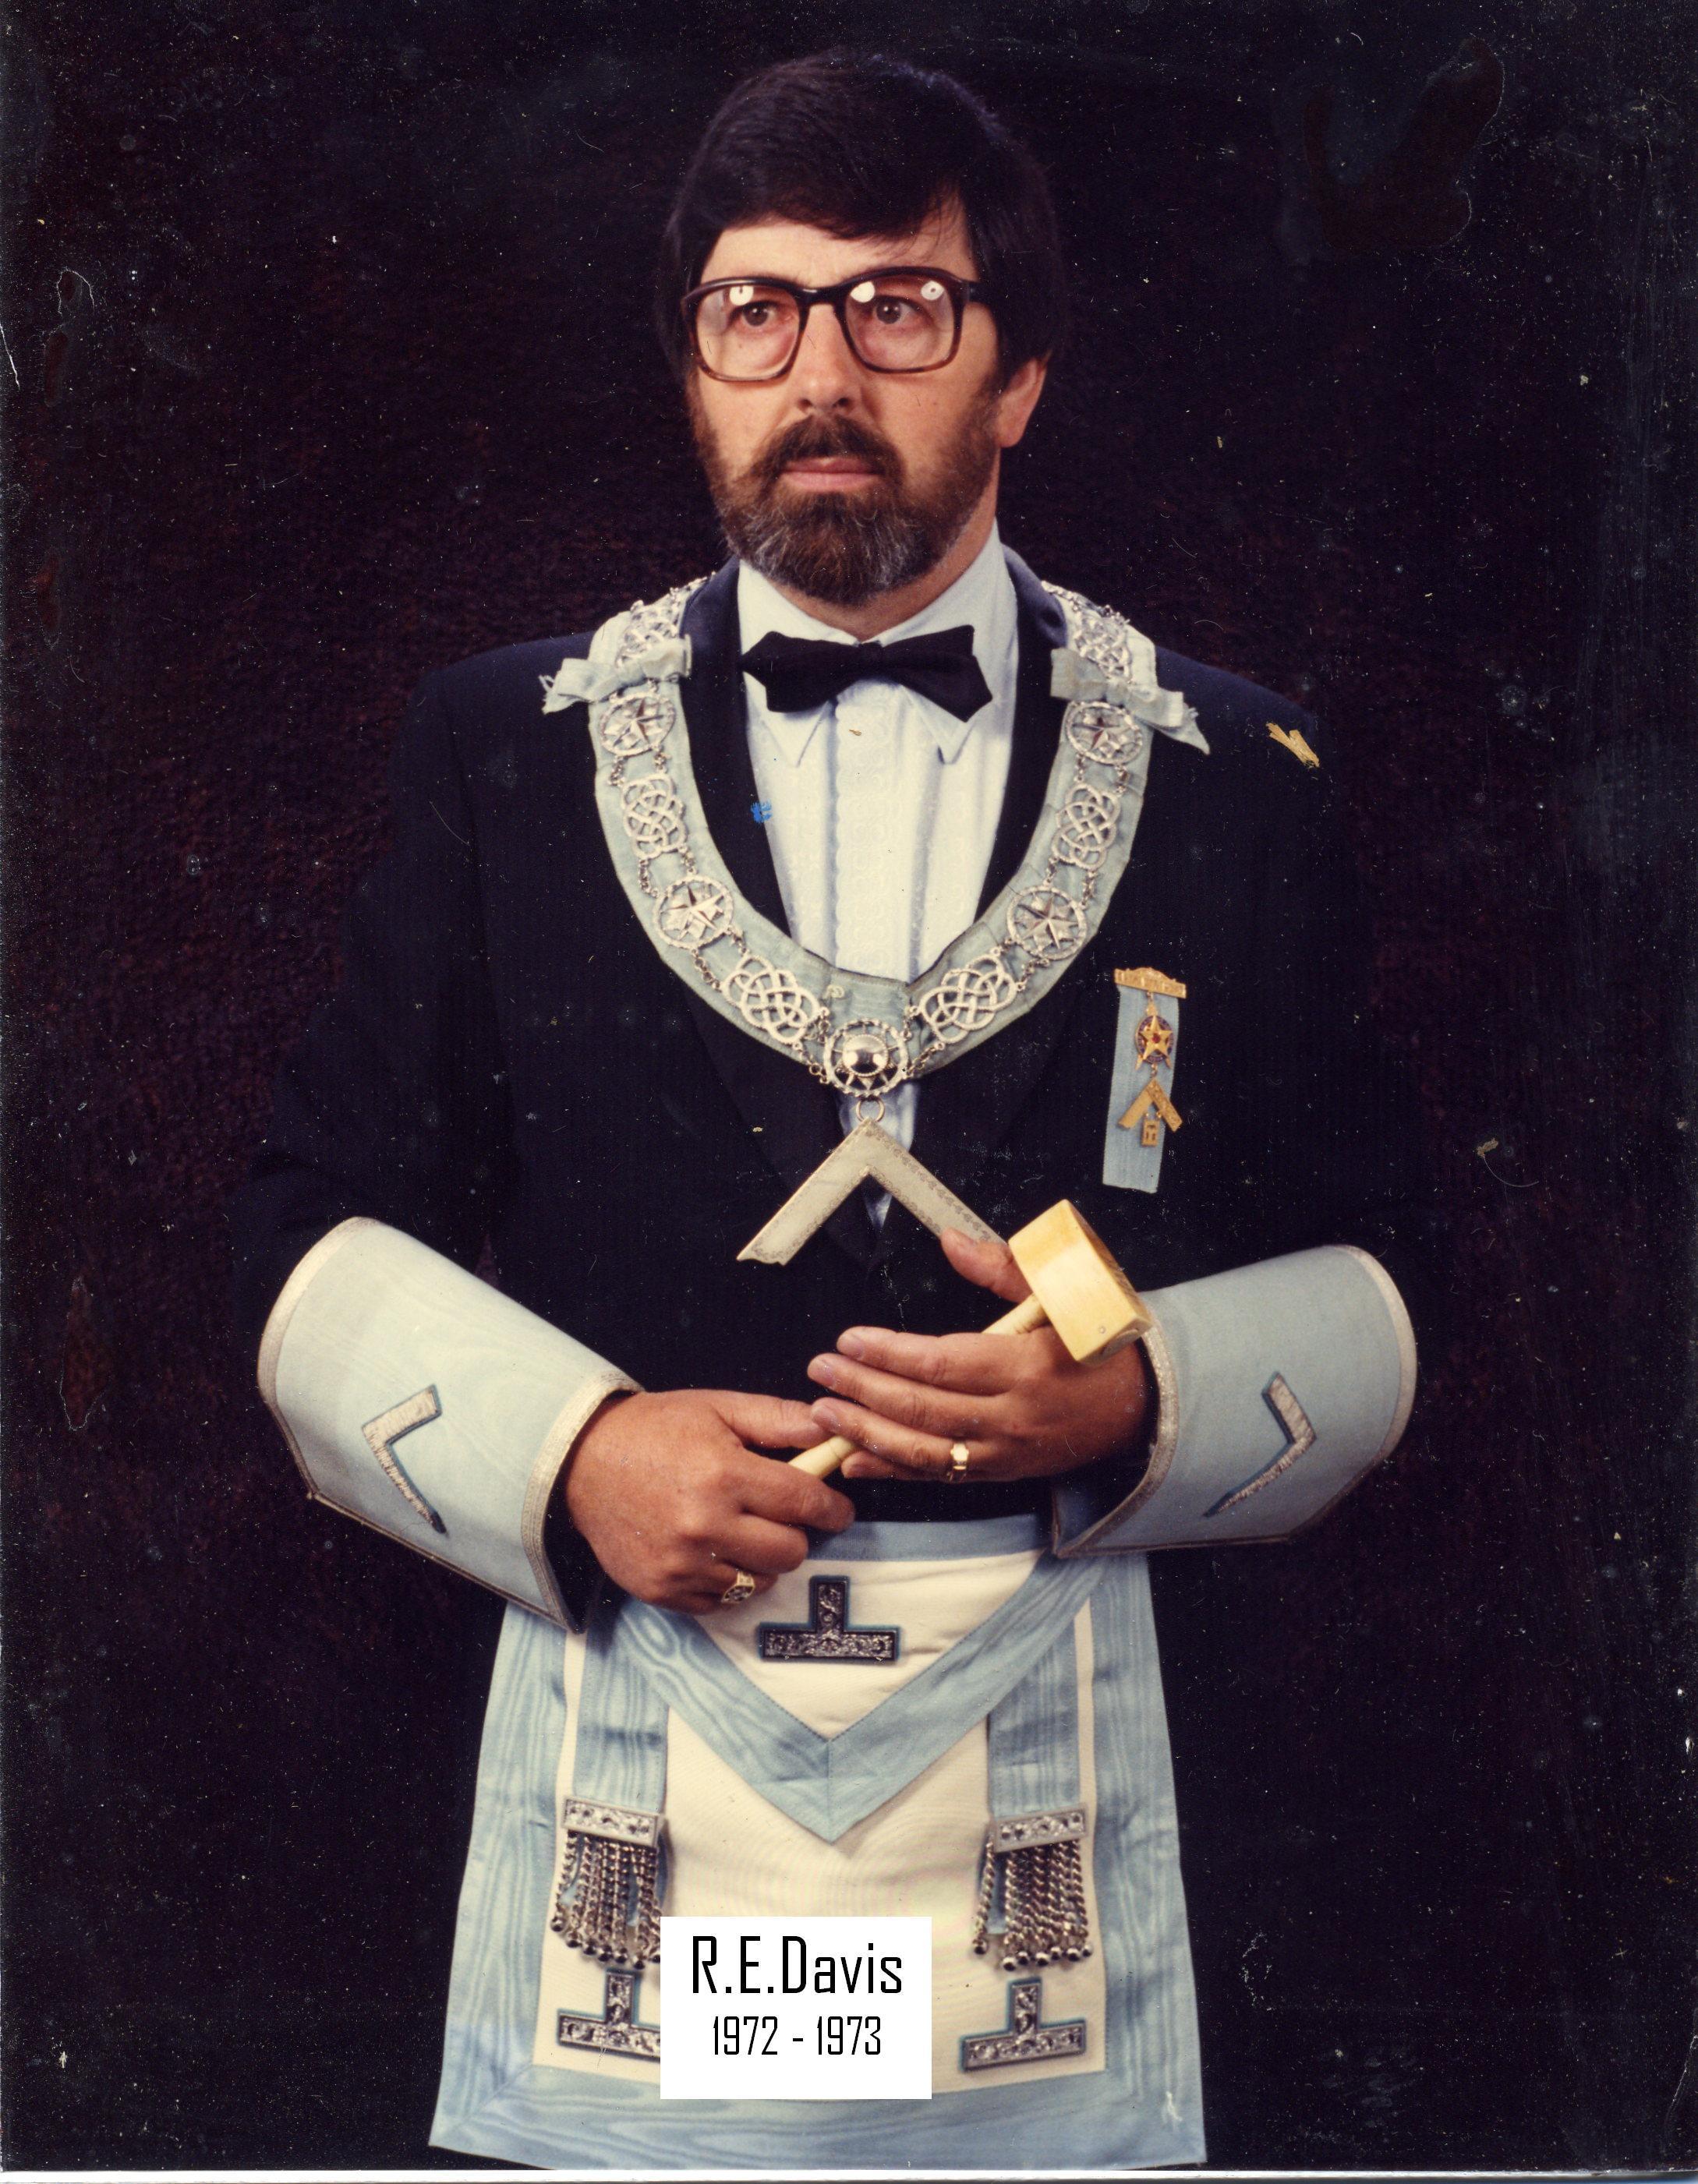 Robert Erwin Davis 1972-73